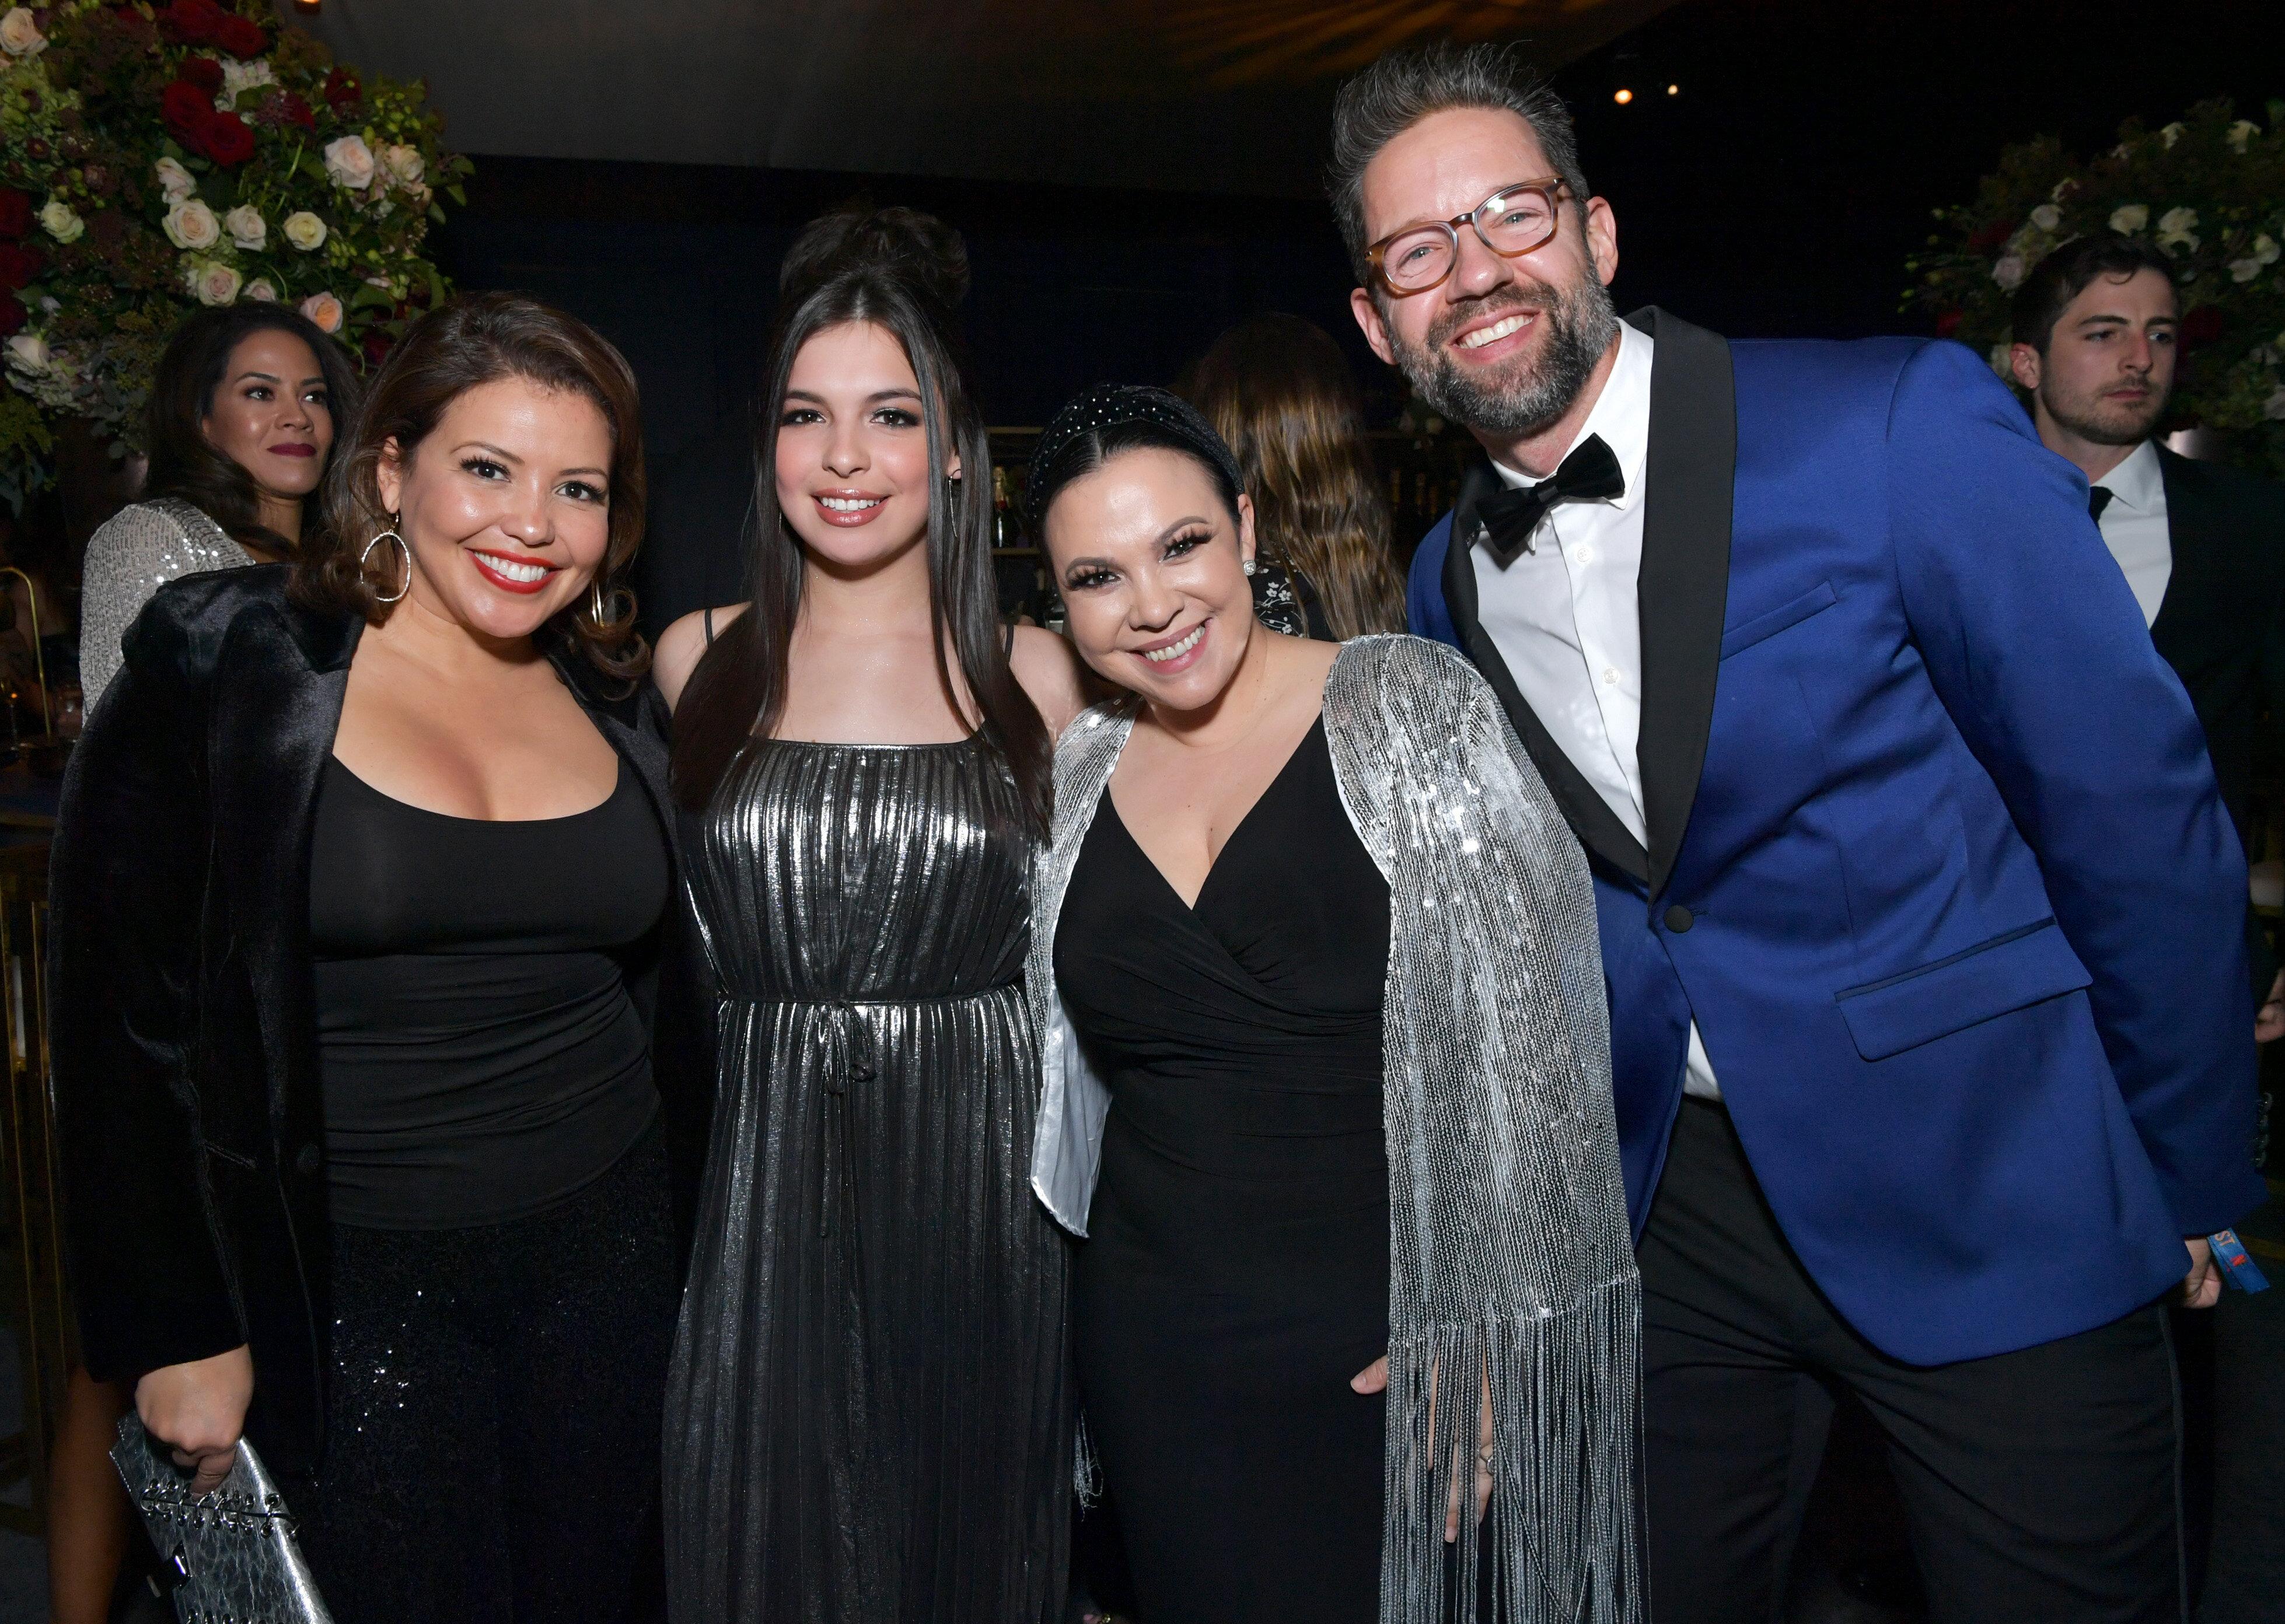 (Left to right) Justina Machado, Isabella Gomez, Gloria Calderon Kellett and Todd Grinnell attend the Netflix 2020 Golden Glo